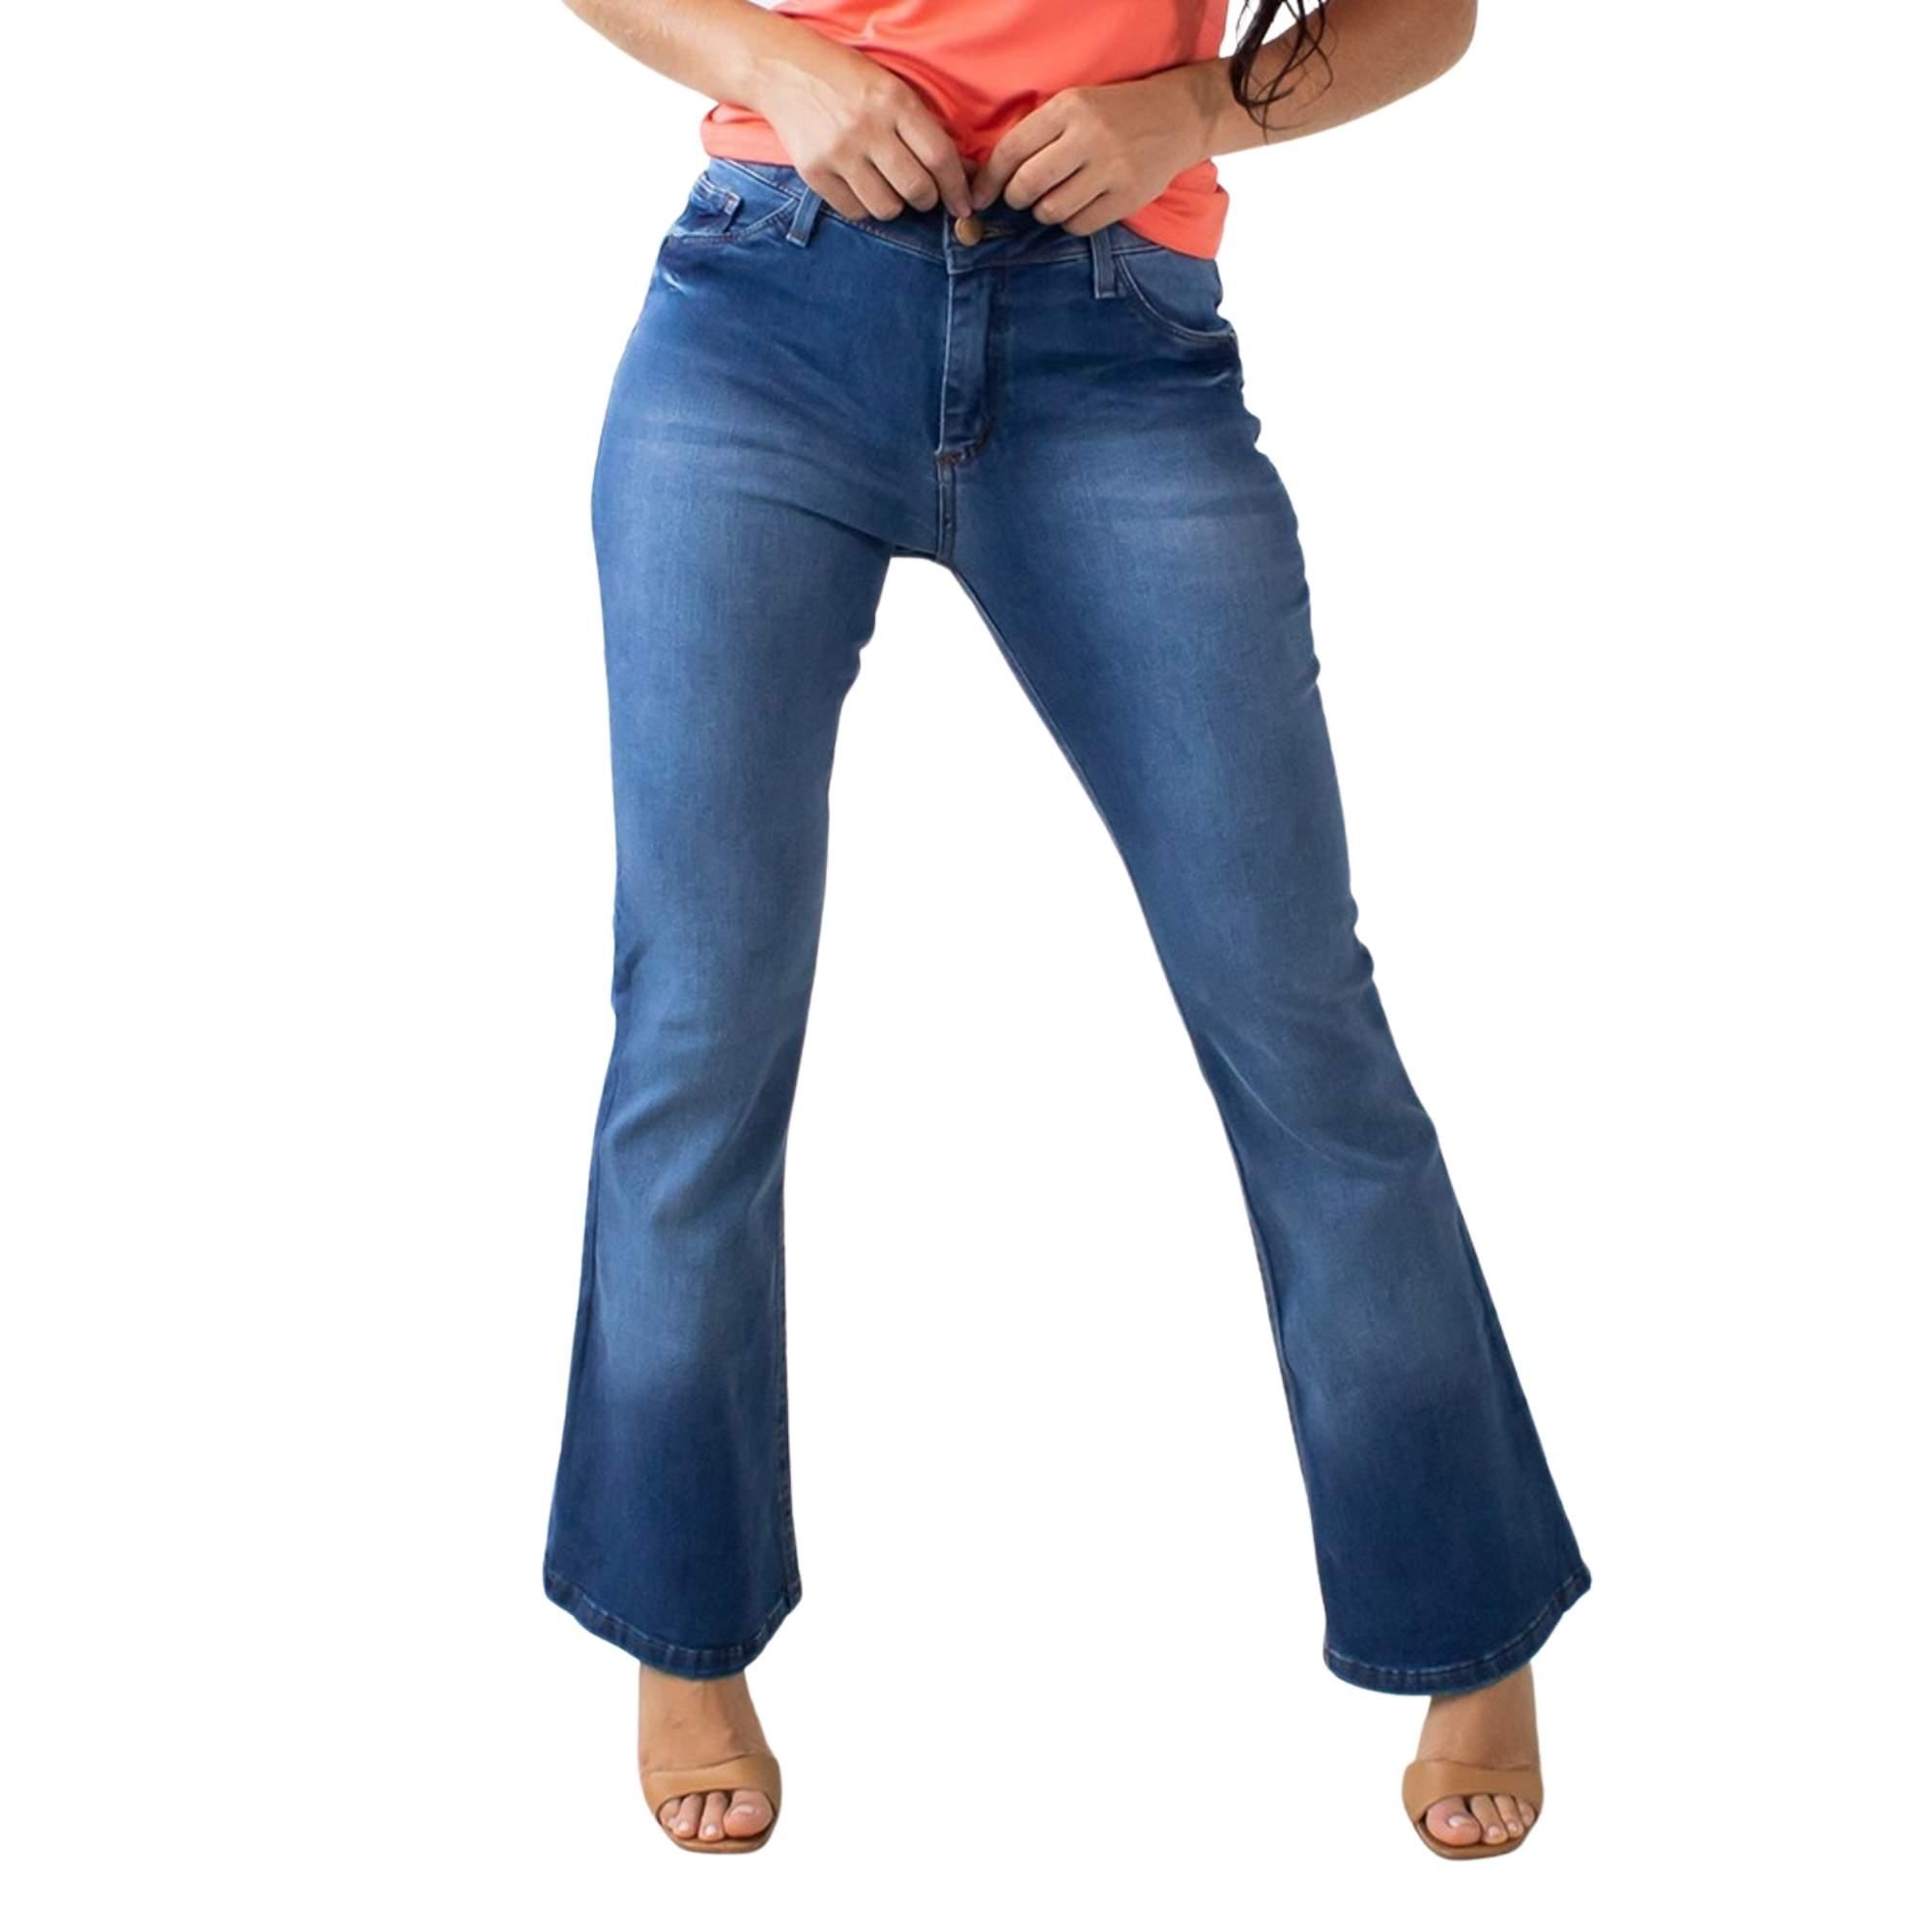 Calça Feminina Anticorpus 13450